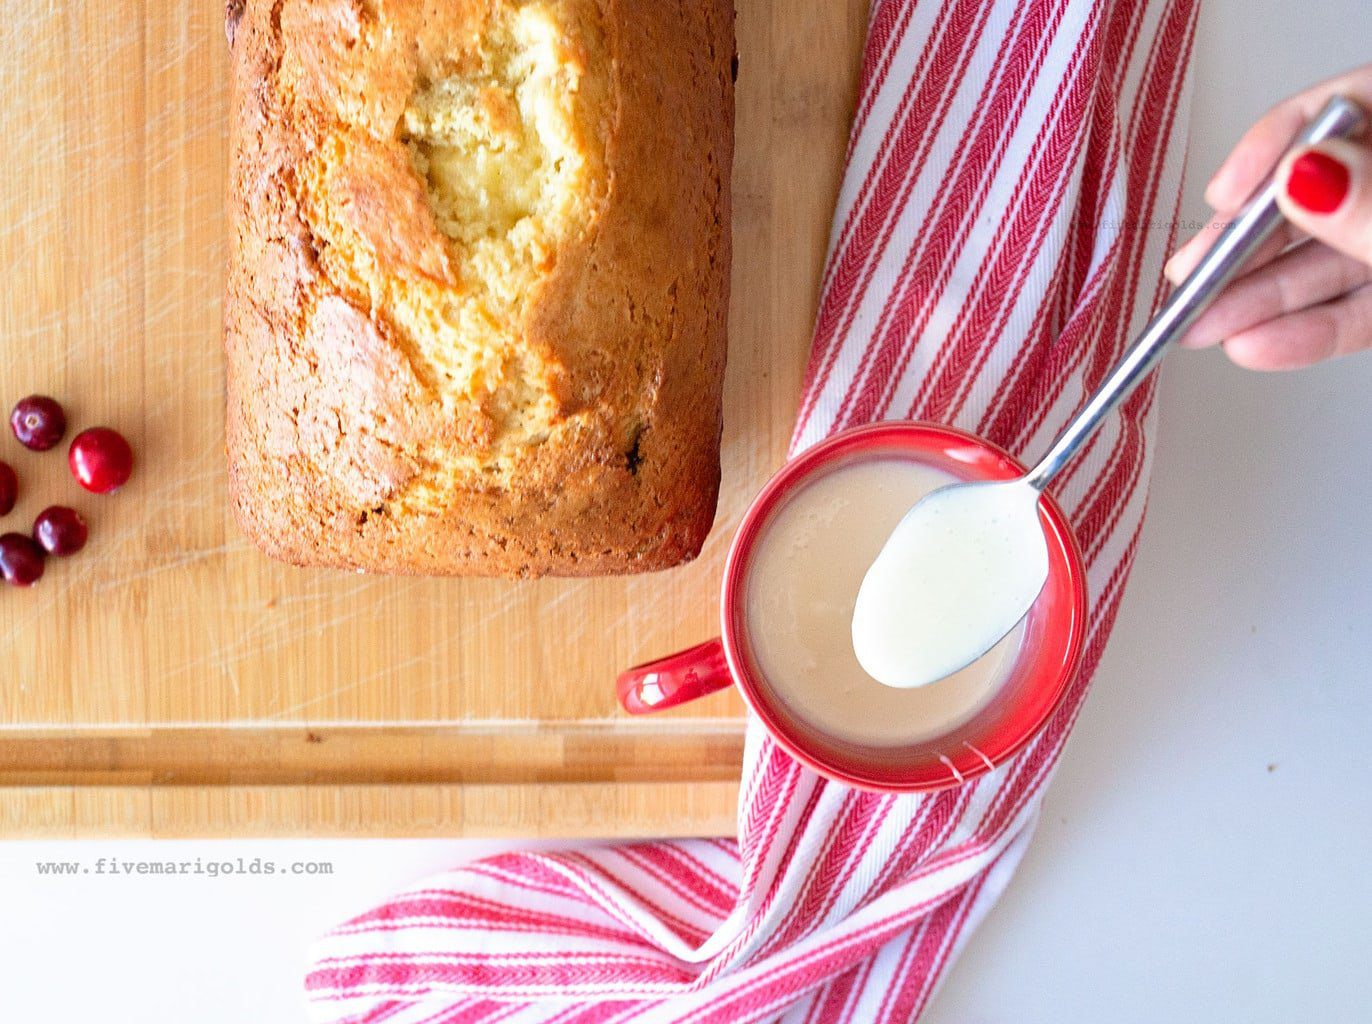 Cinnamon Eggnog Bread Recipe for Christmas | Five Marigolds